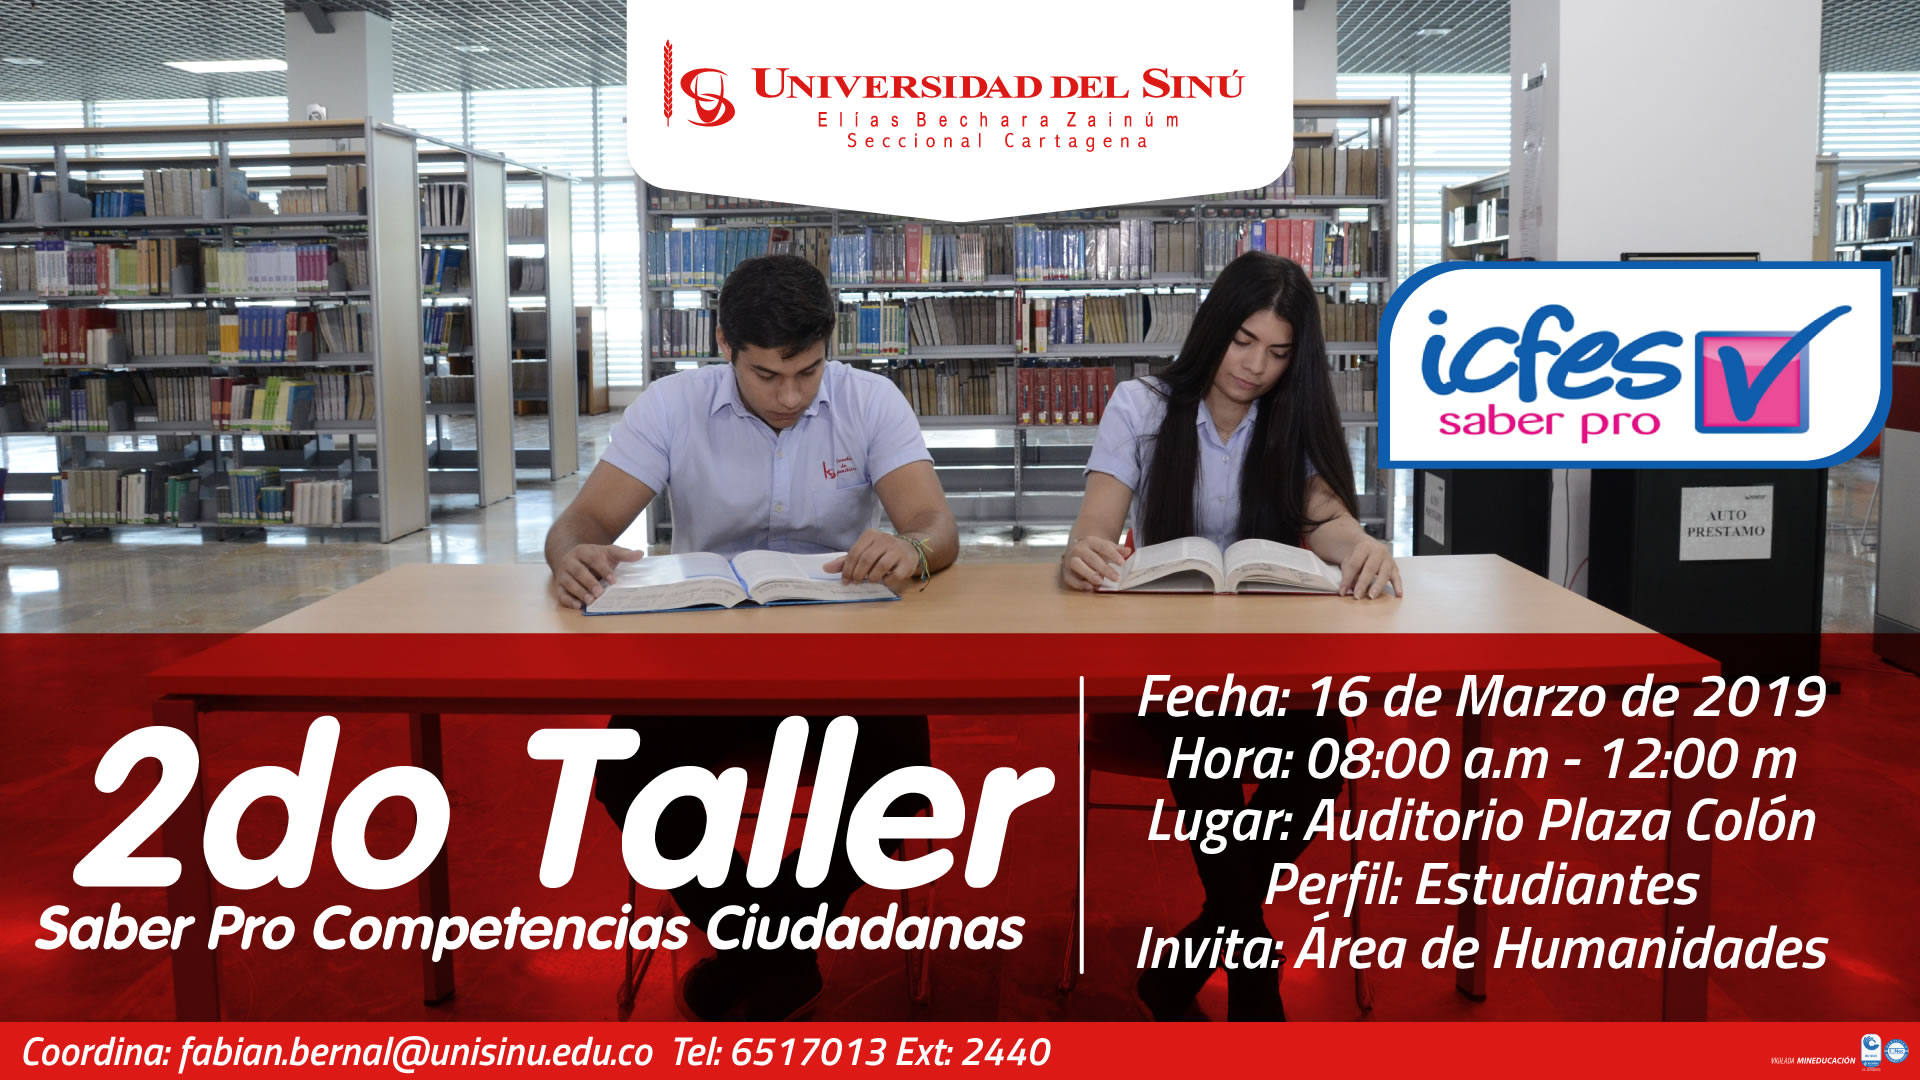 2do-taller-saber-pro-competencias-ciudadanas